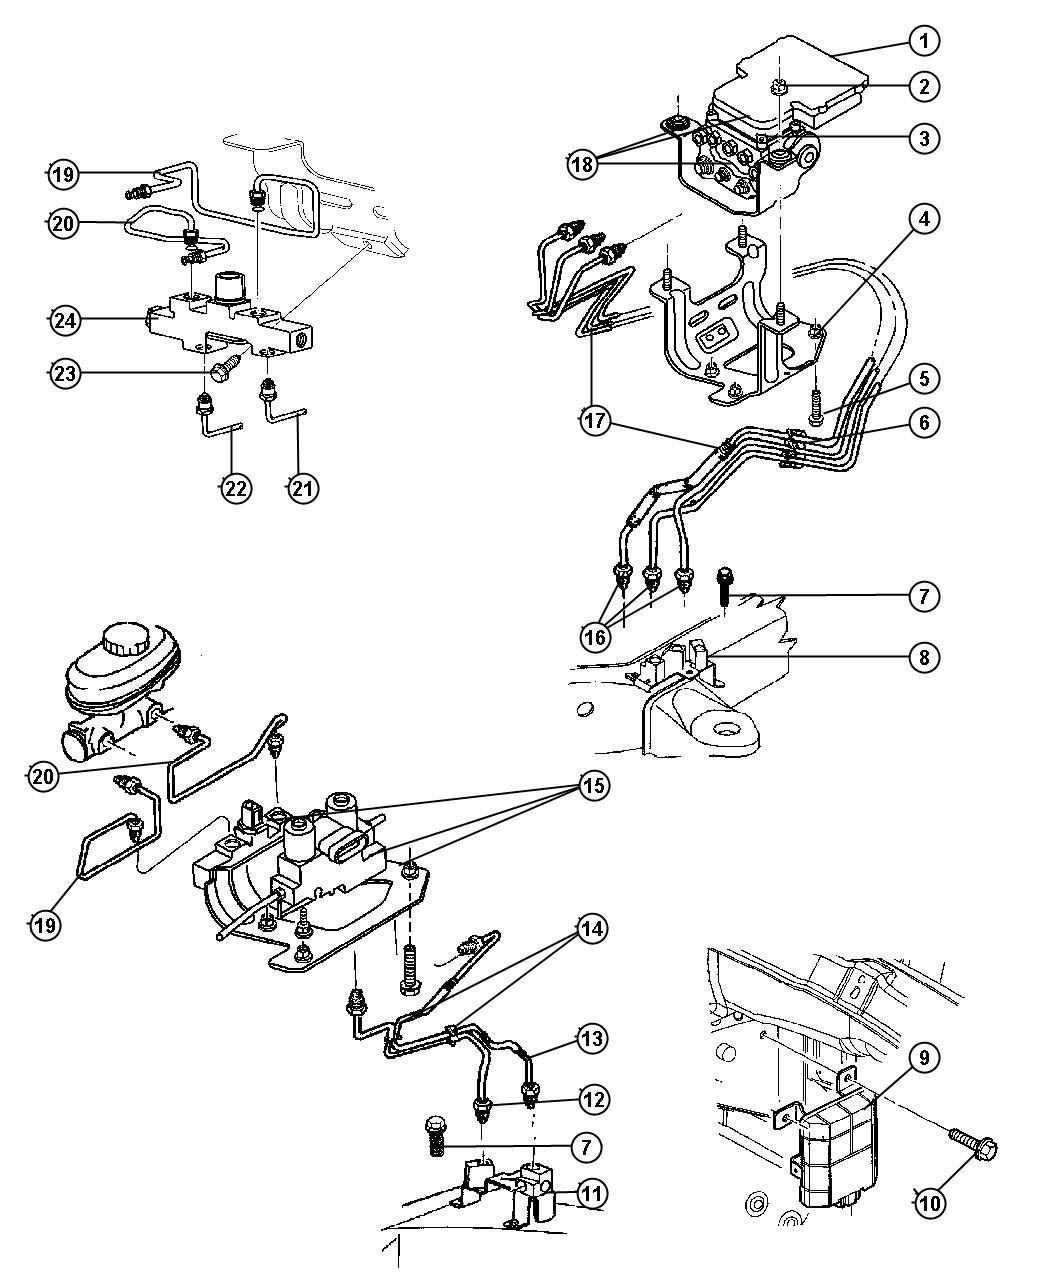 Dodge Ram 1500 Module. Anti-lock brakes. [4-wheel anti